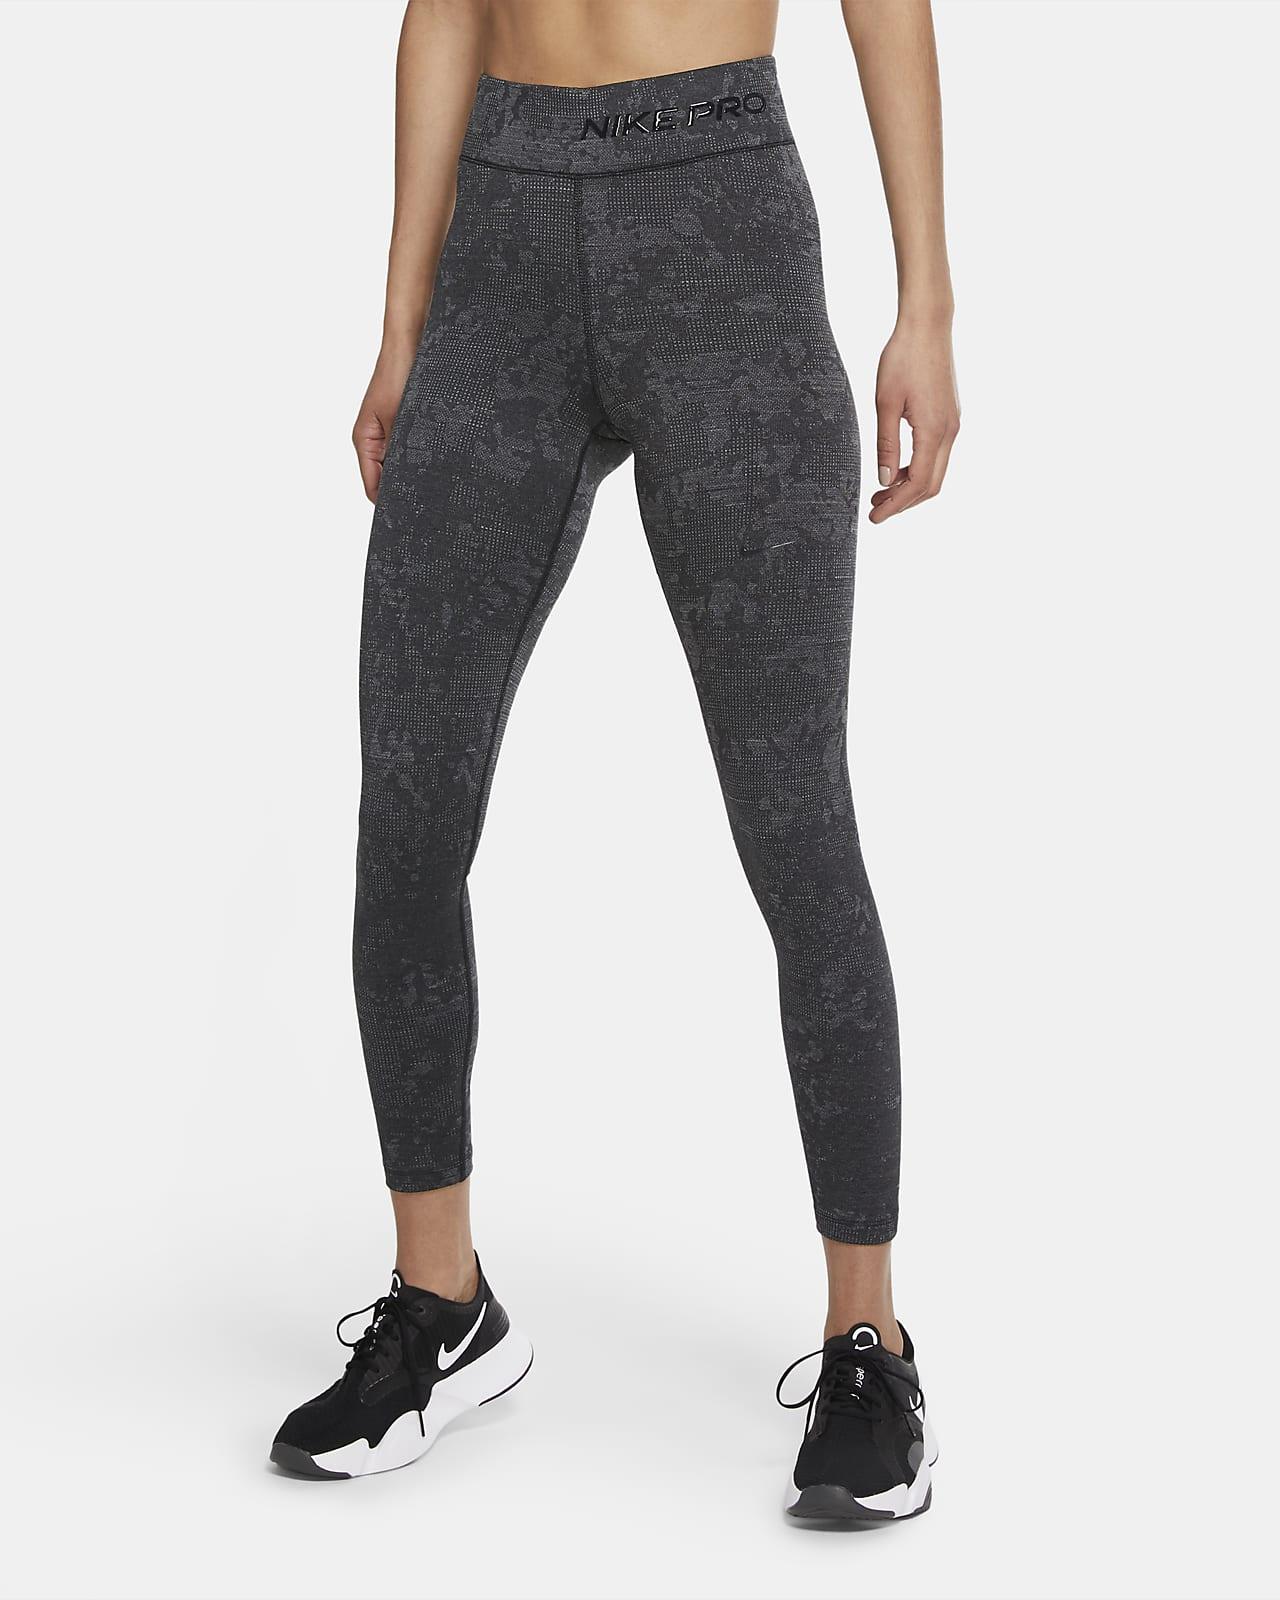 Nike Pro HyperWarm-termotights til kvinder